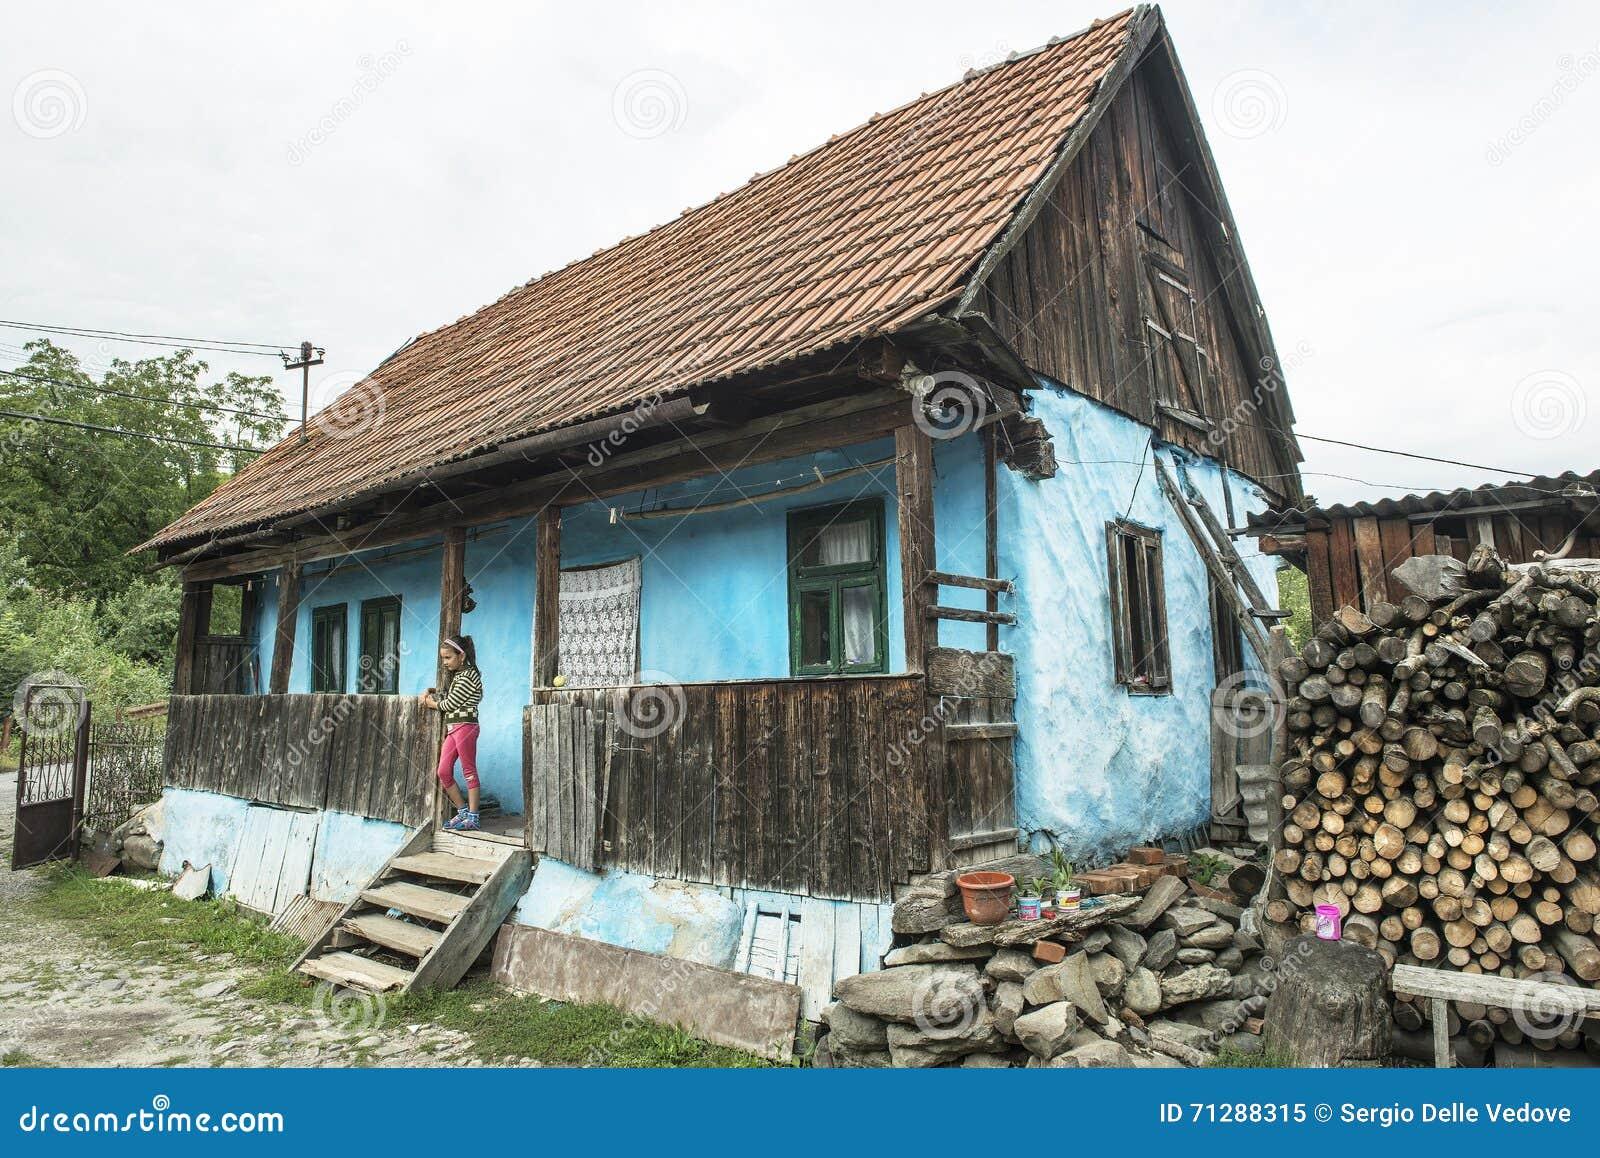 Typical wooden boats of zanzibar editorial image 85624152 - Houses maramures wood ...